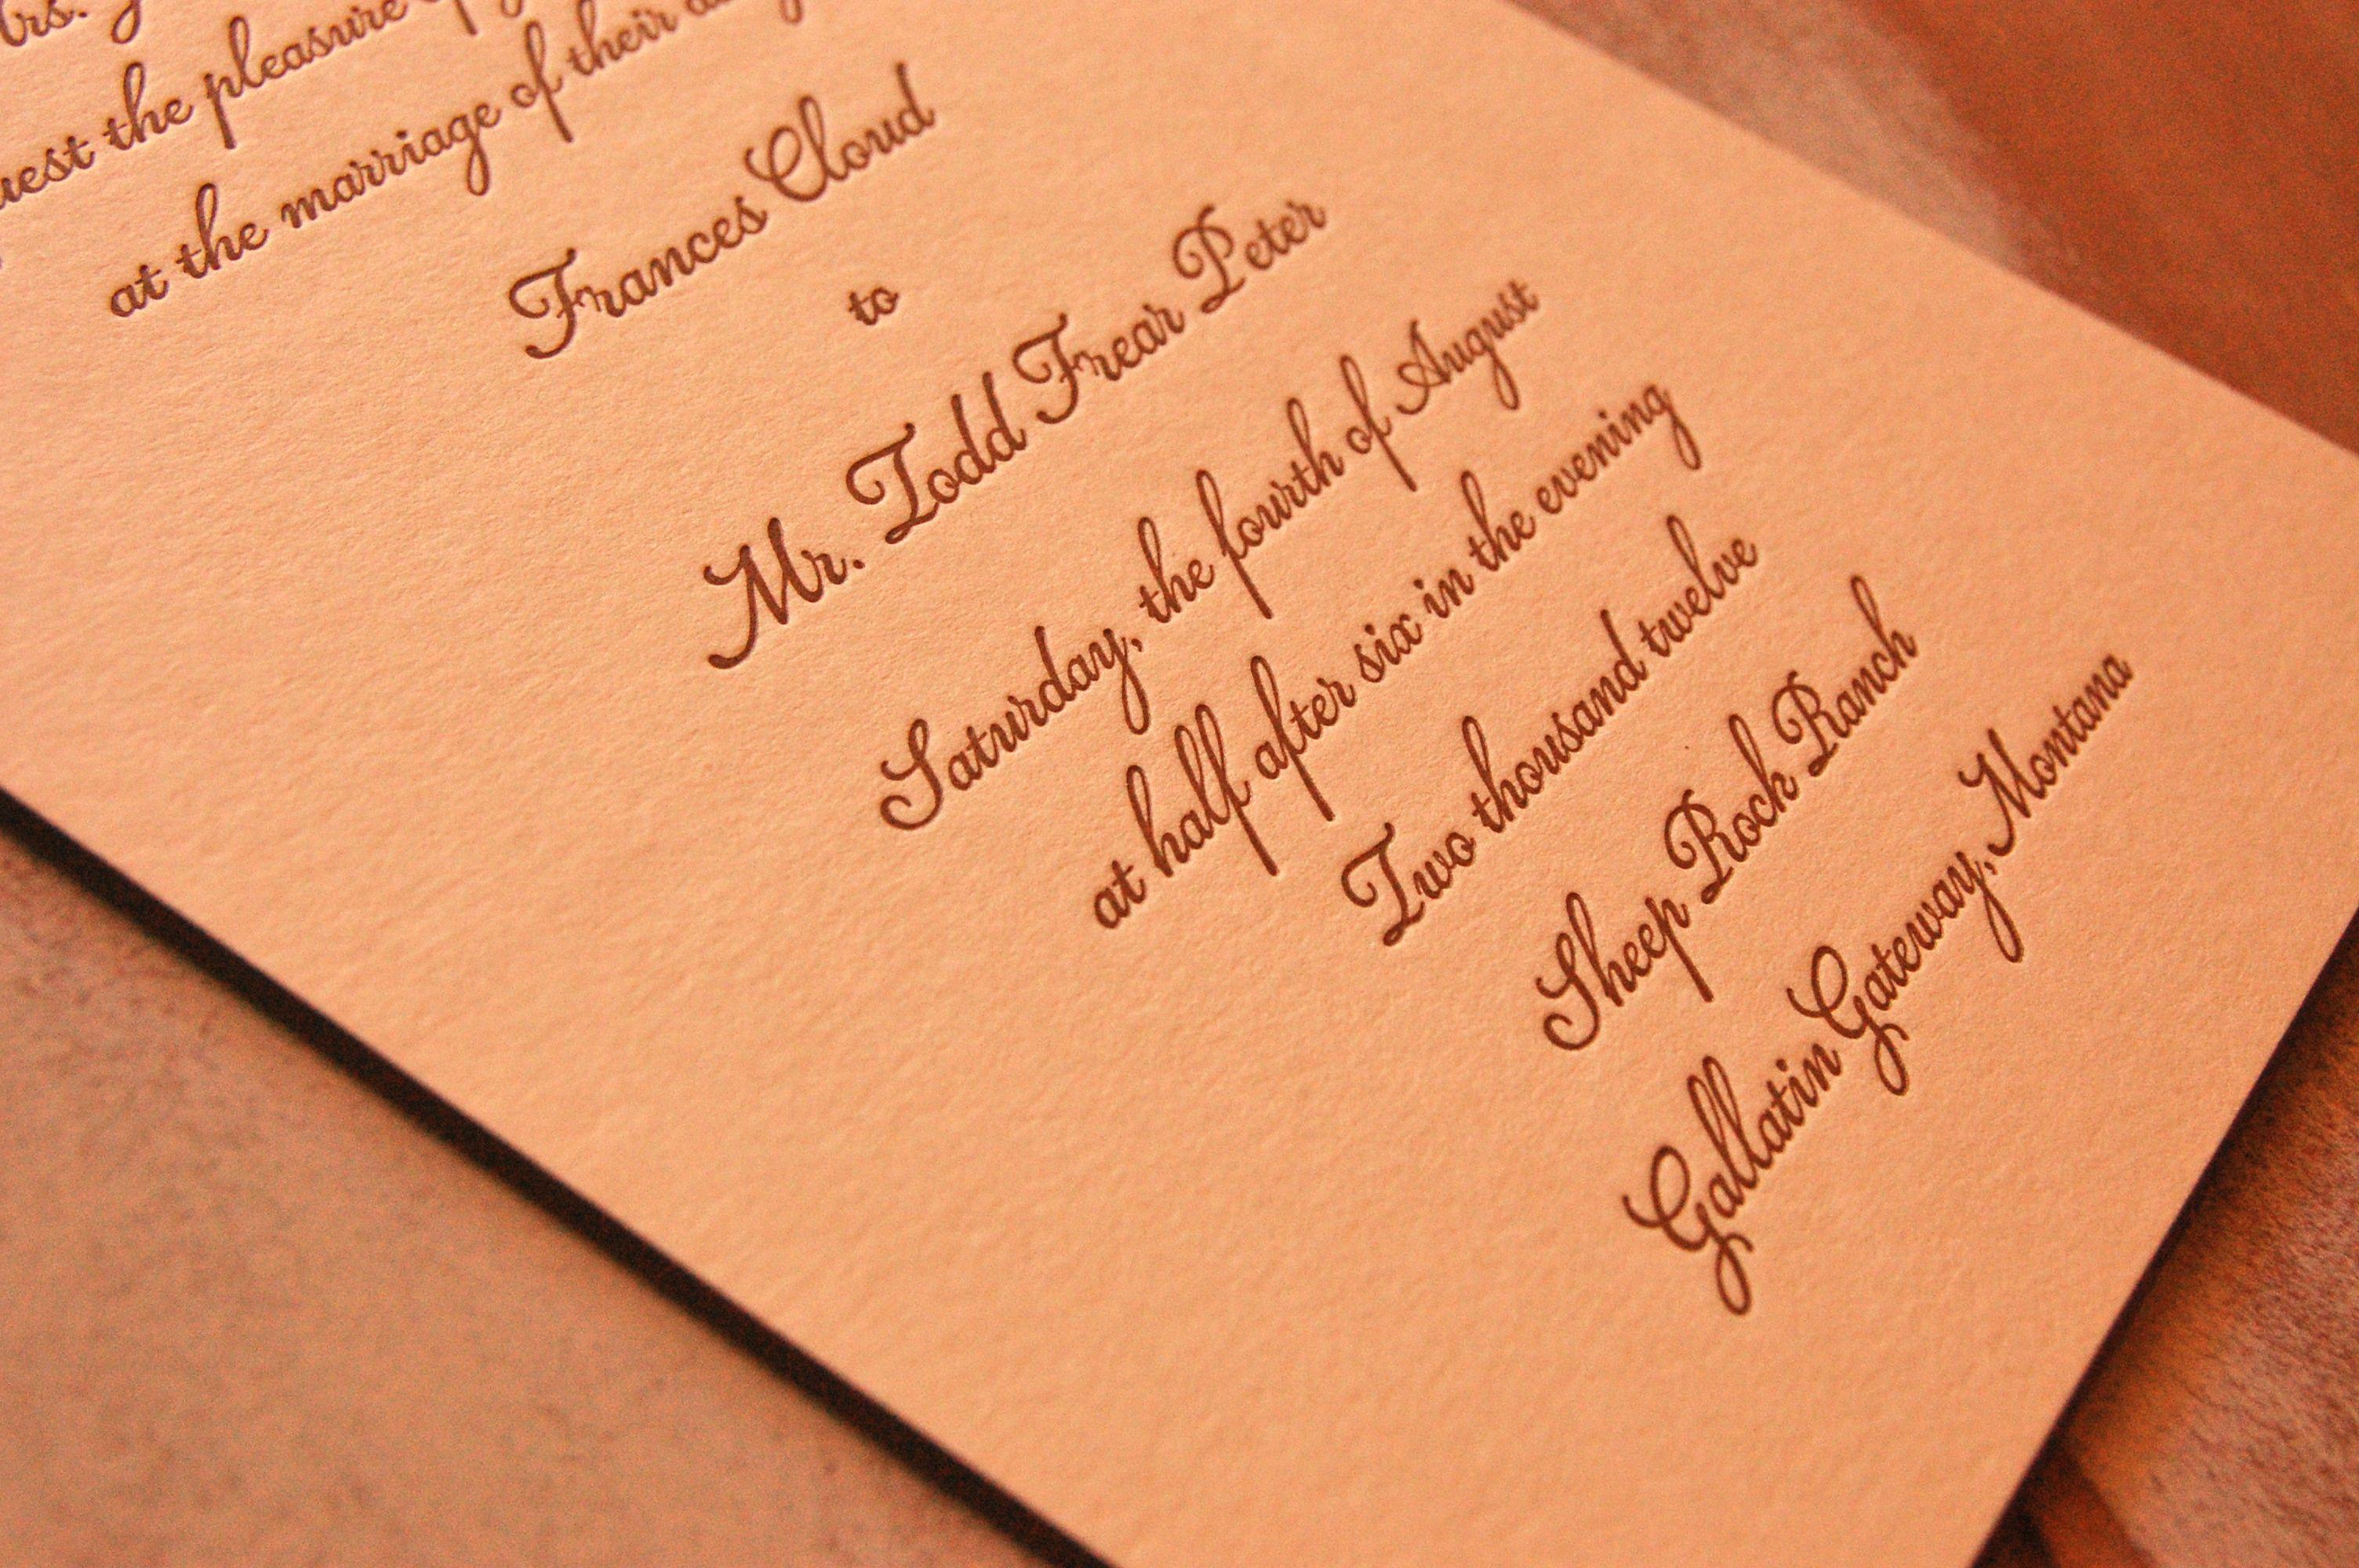 Wedding Invitations William Arthur: Letterpressed William Arthur Invite With Hand-painted